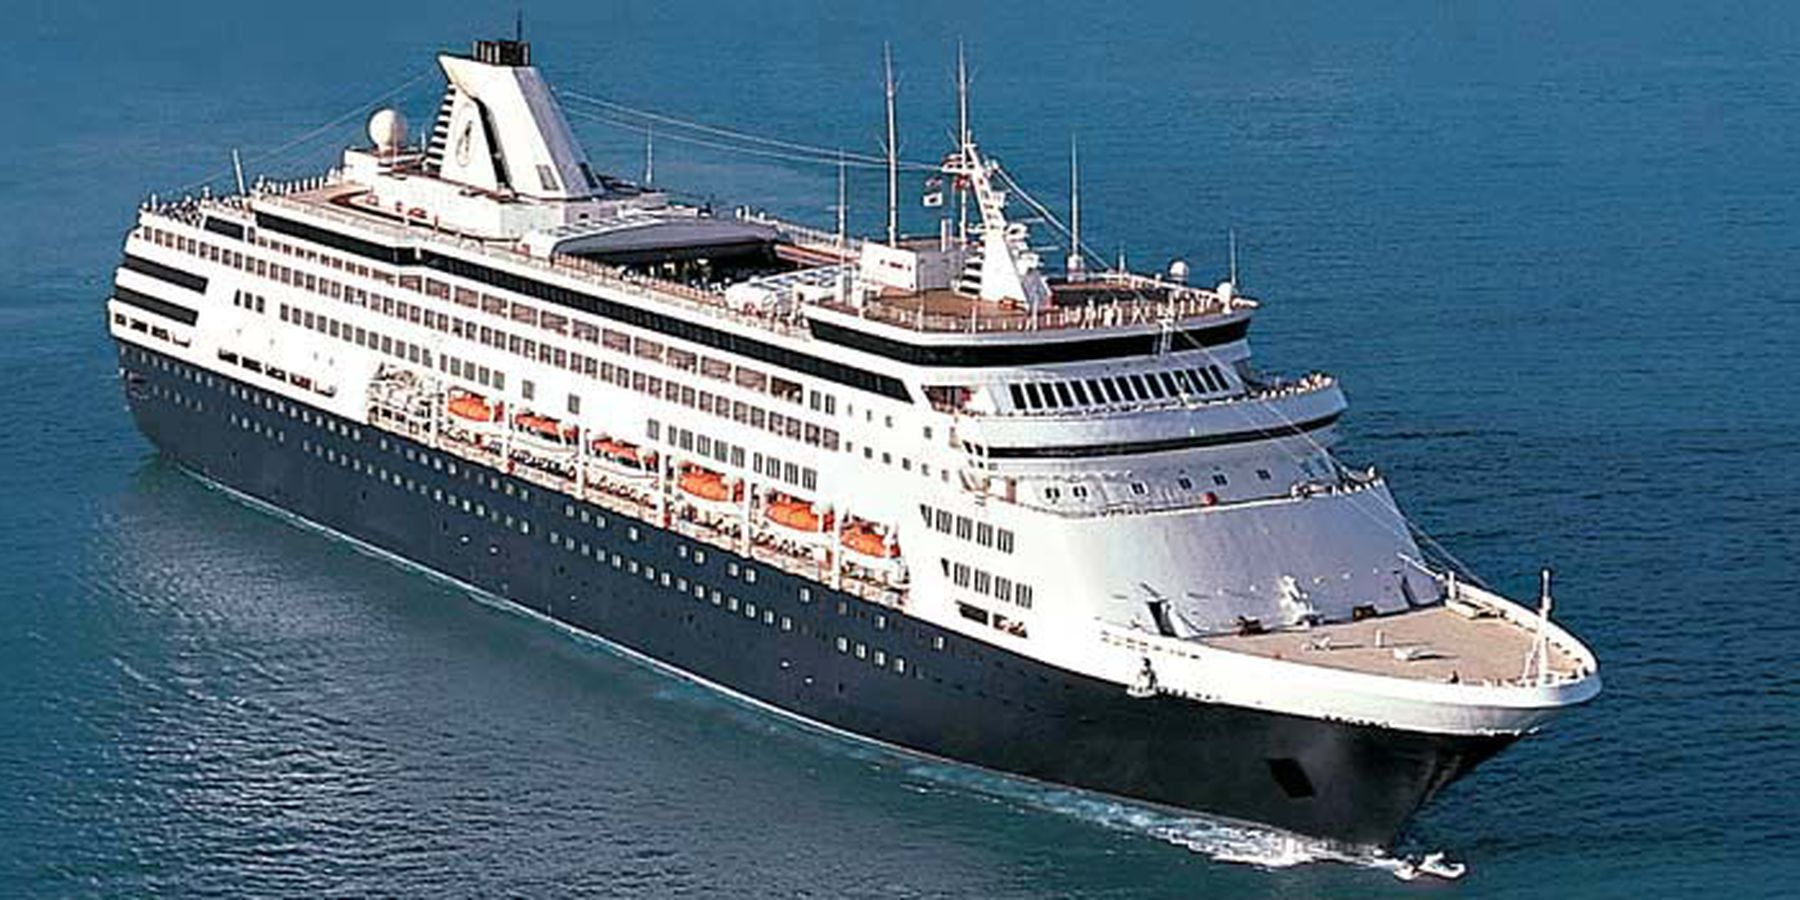 ms Maasdam - Holland America Line - Cruisevakantie - Doets Reizen